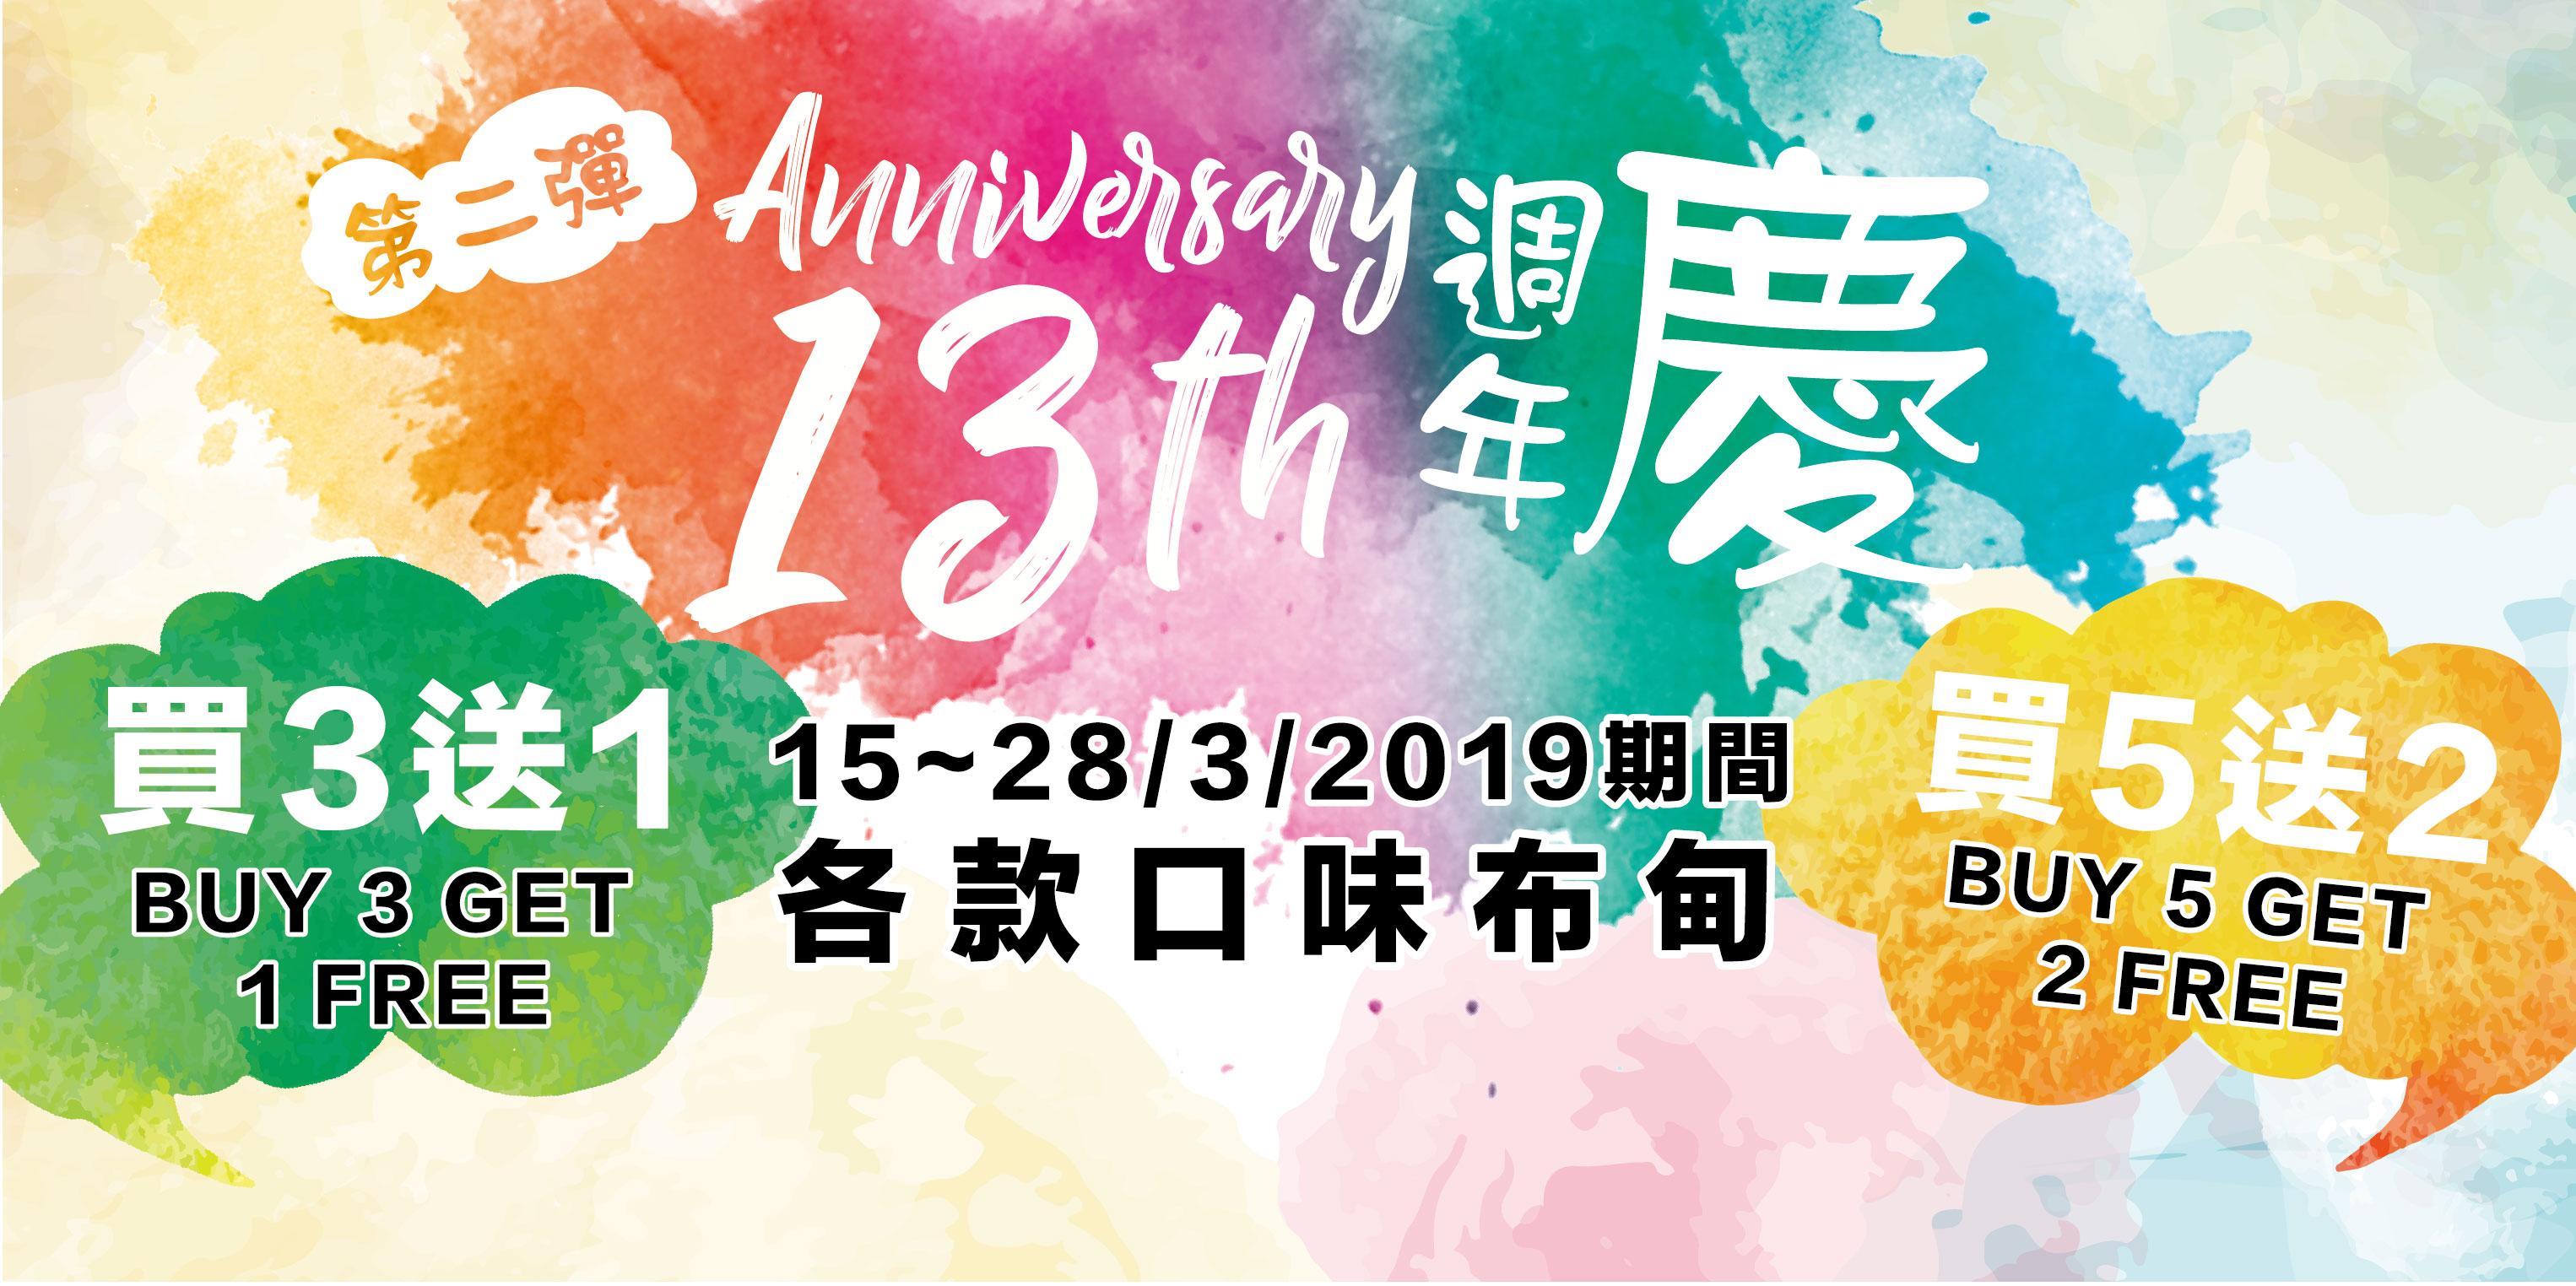 MILKTOP 13週年慶 - 激安優惠第二彈